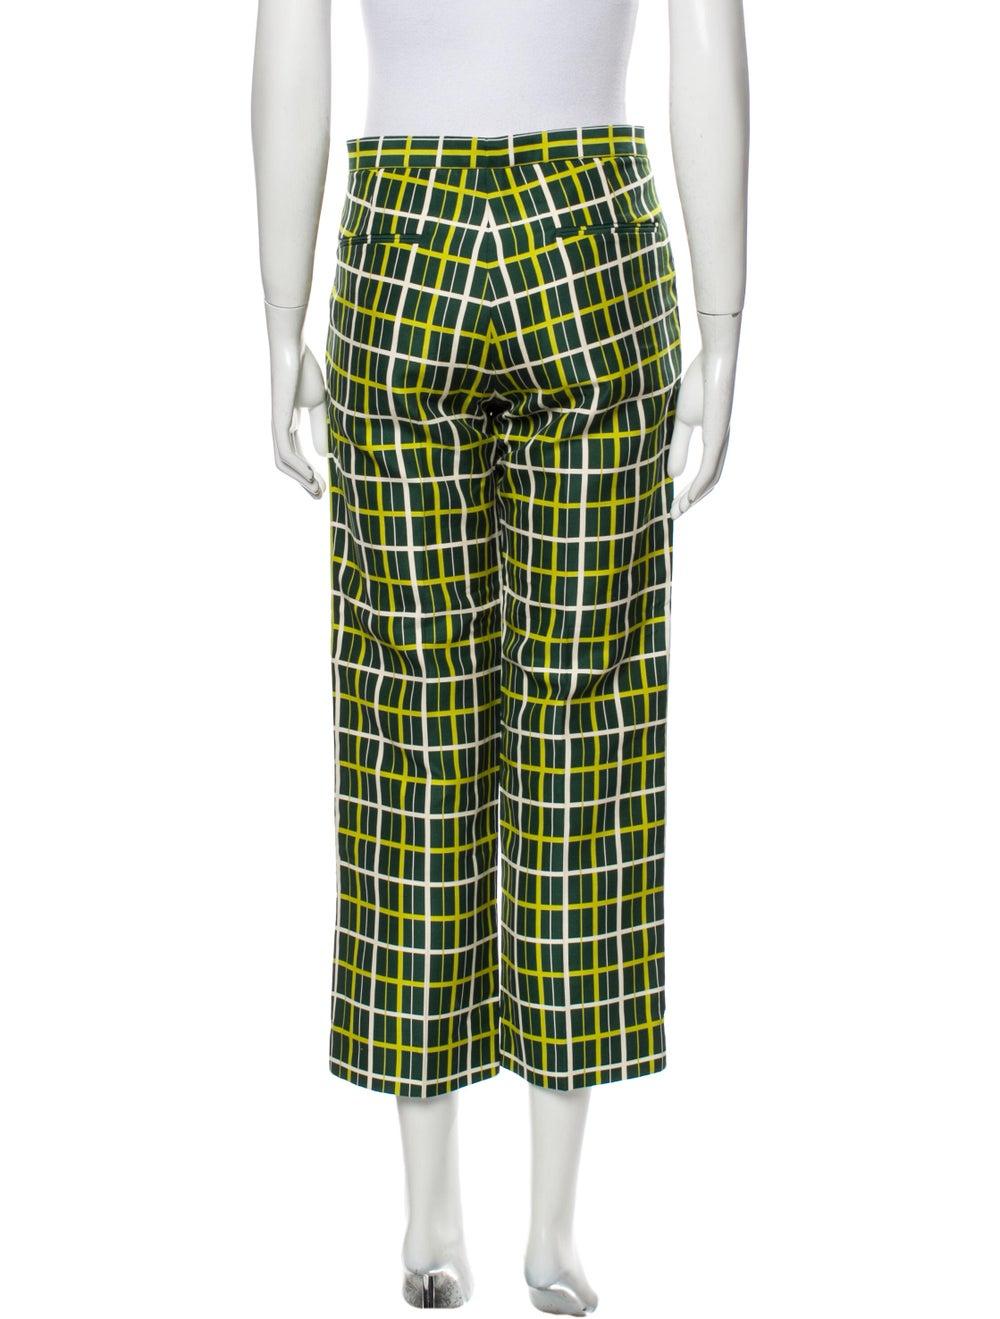 Marni Plaid Print Straight Leg Pants Green - image 3